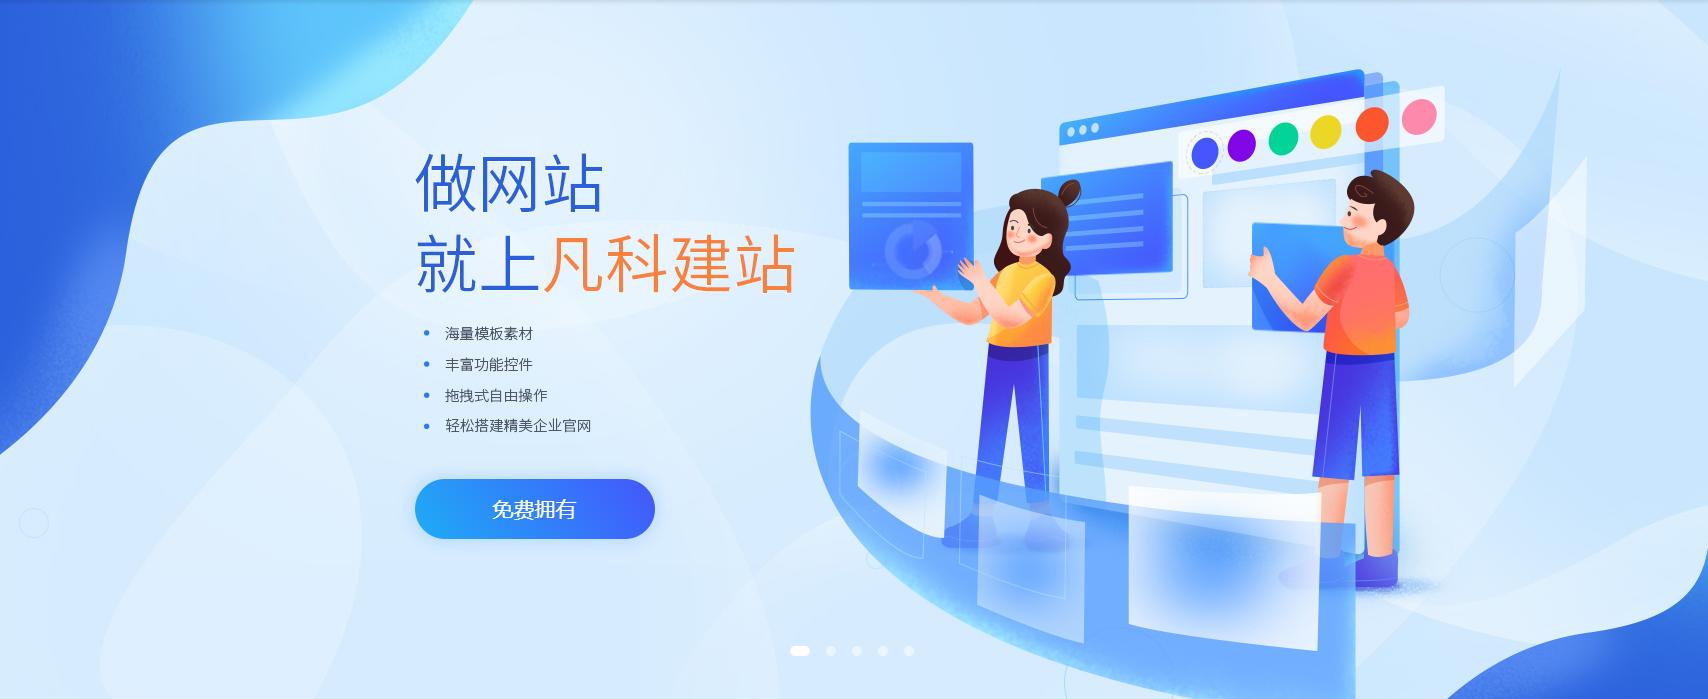 CDN加速让网站服务器更加稳定